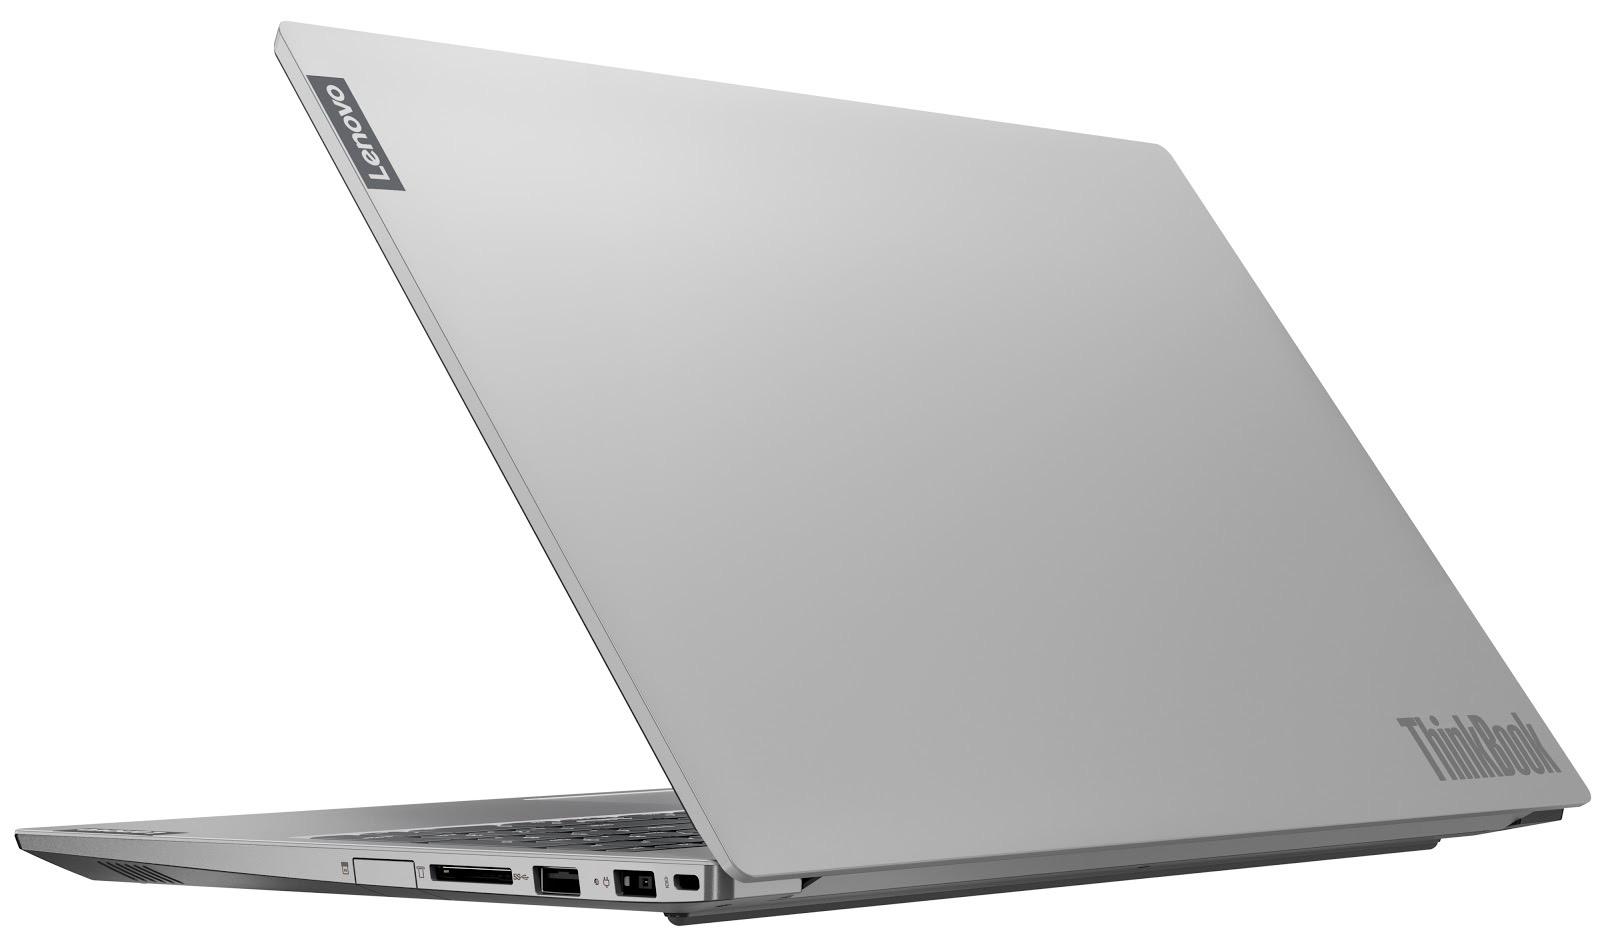 Фото 1. Ноутбук Lenovo ThinkBook 15-IIL (20SM002JUA)